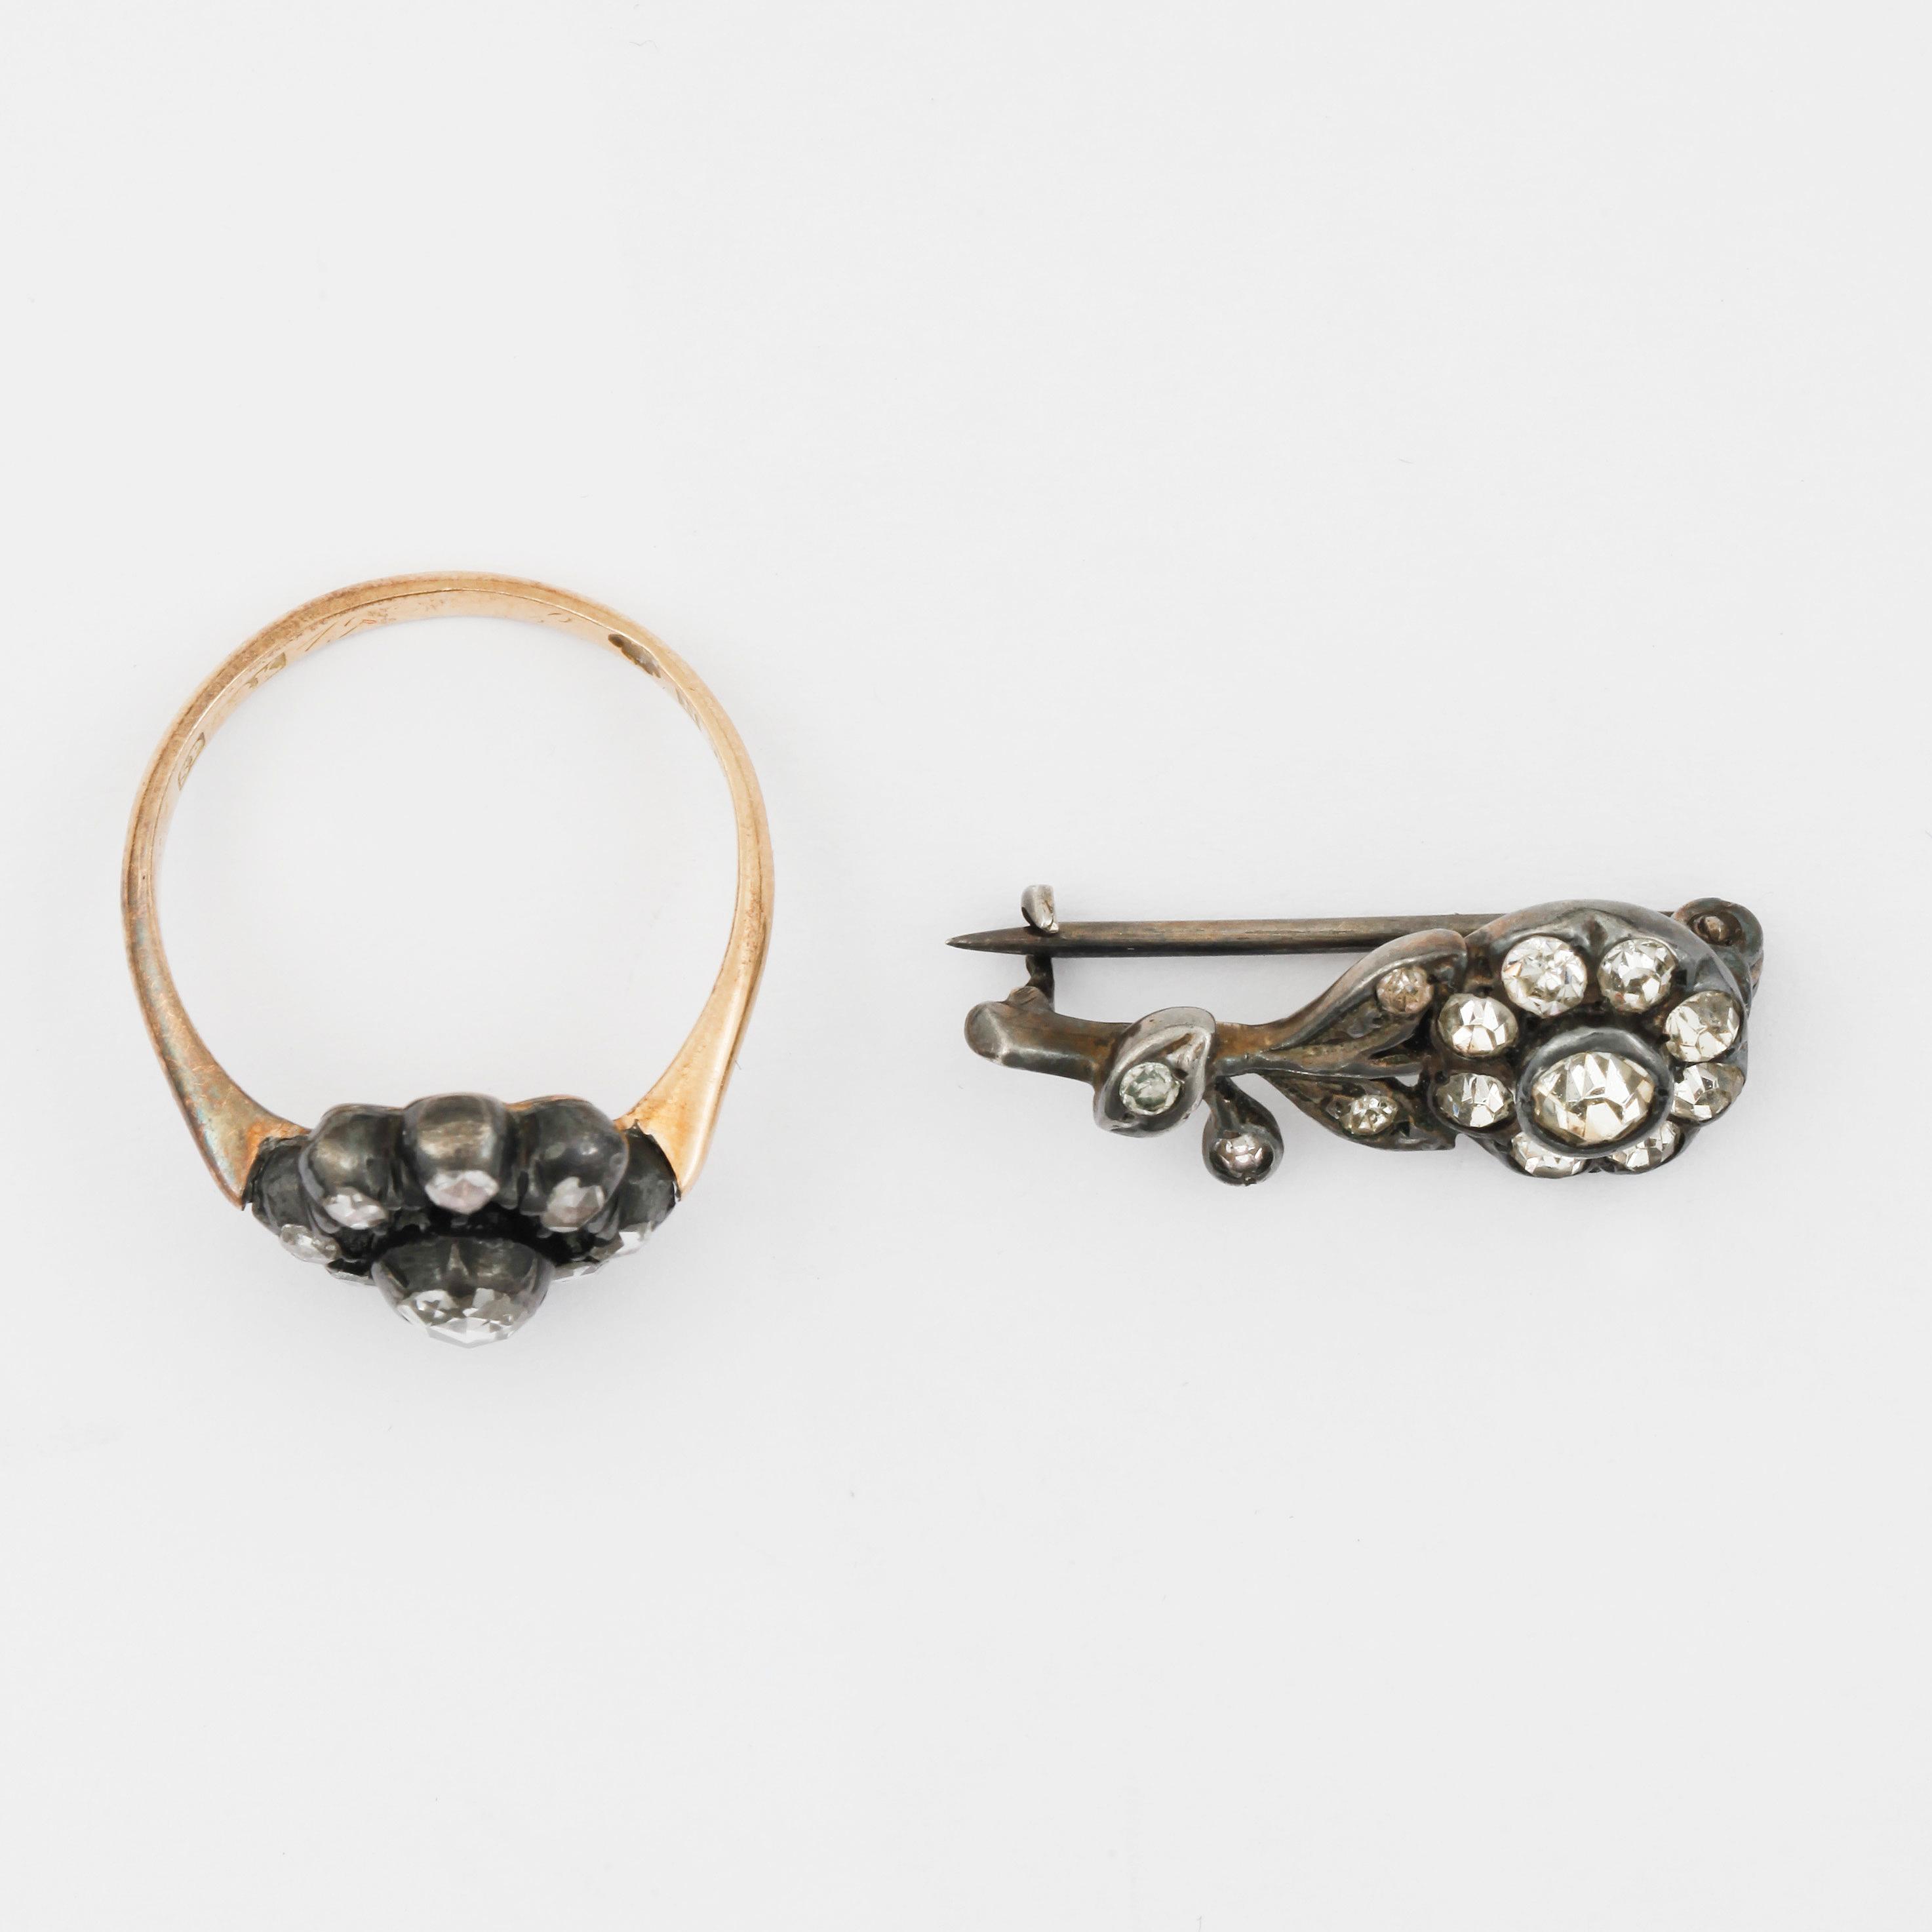 bc0d6adf96bb RING, 18K guld med gammalslipade diamanter, Sam Pettersson, Norrköping,  1916. Vikt ca 3,5g. - Bukowskis